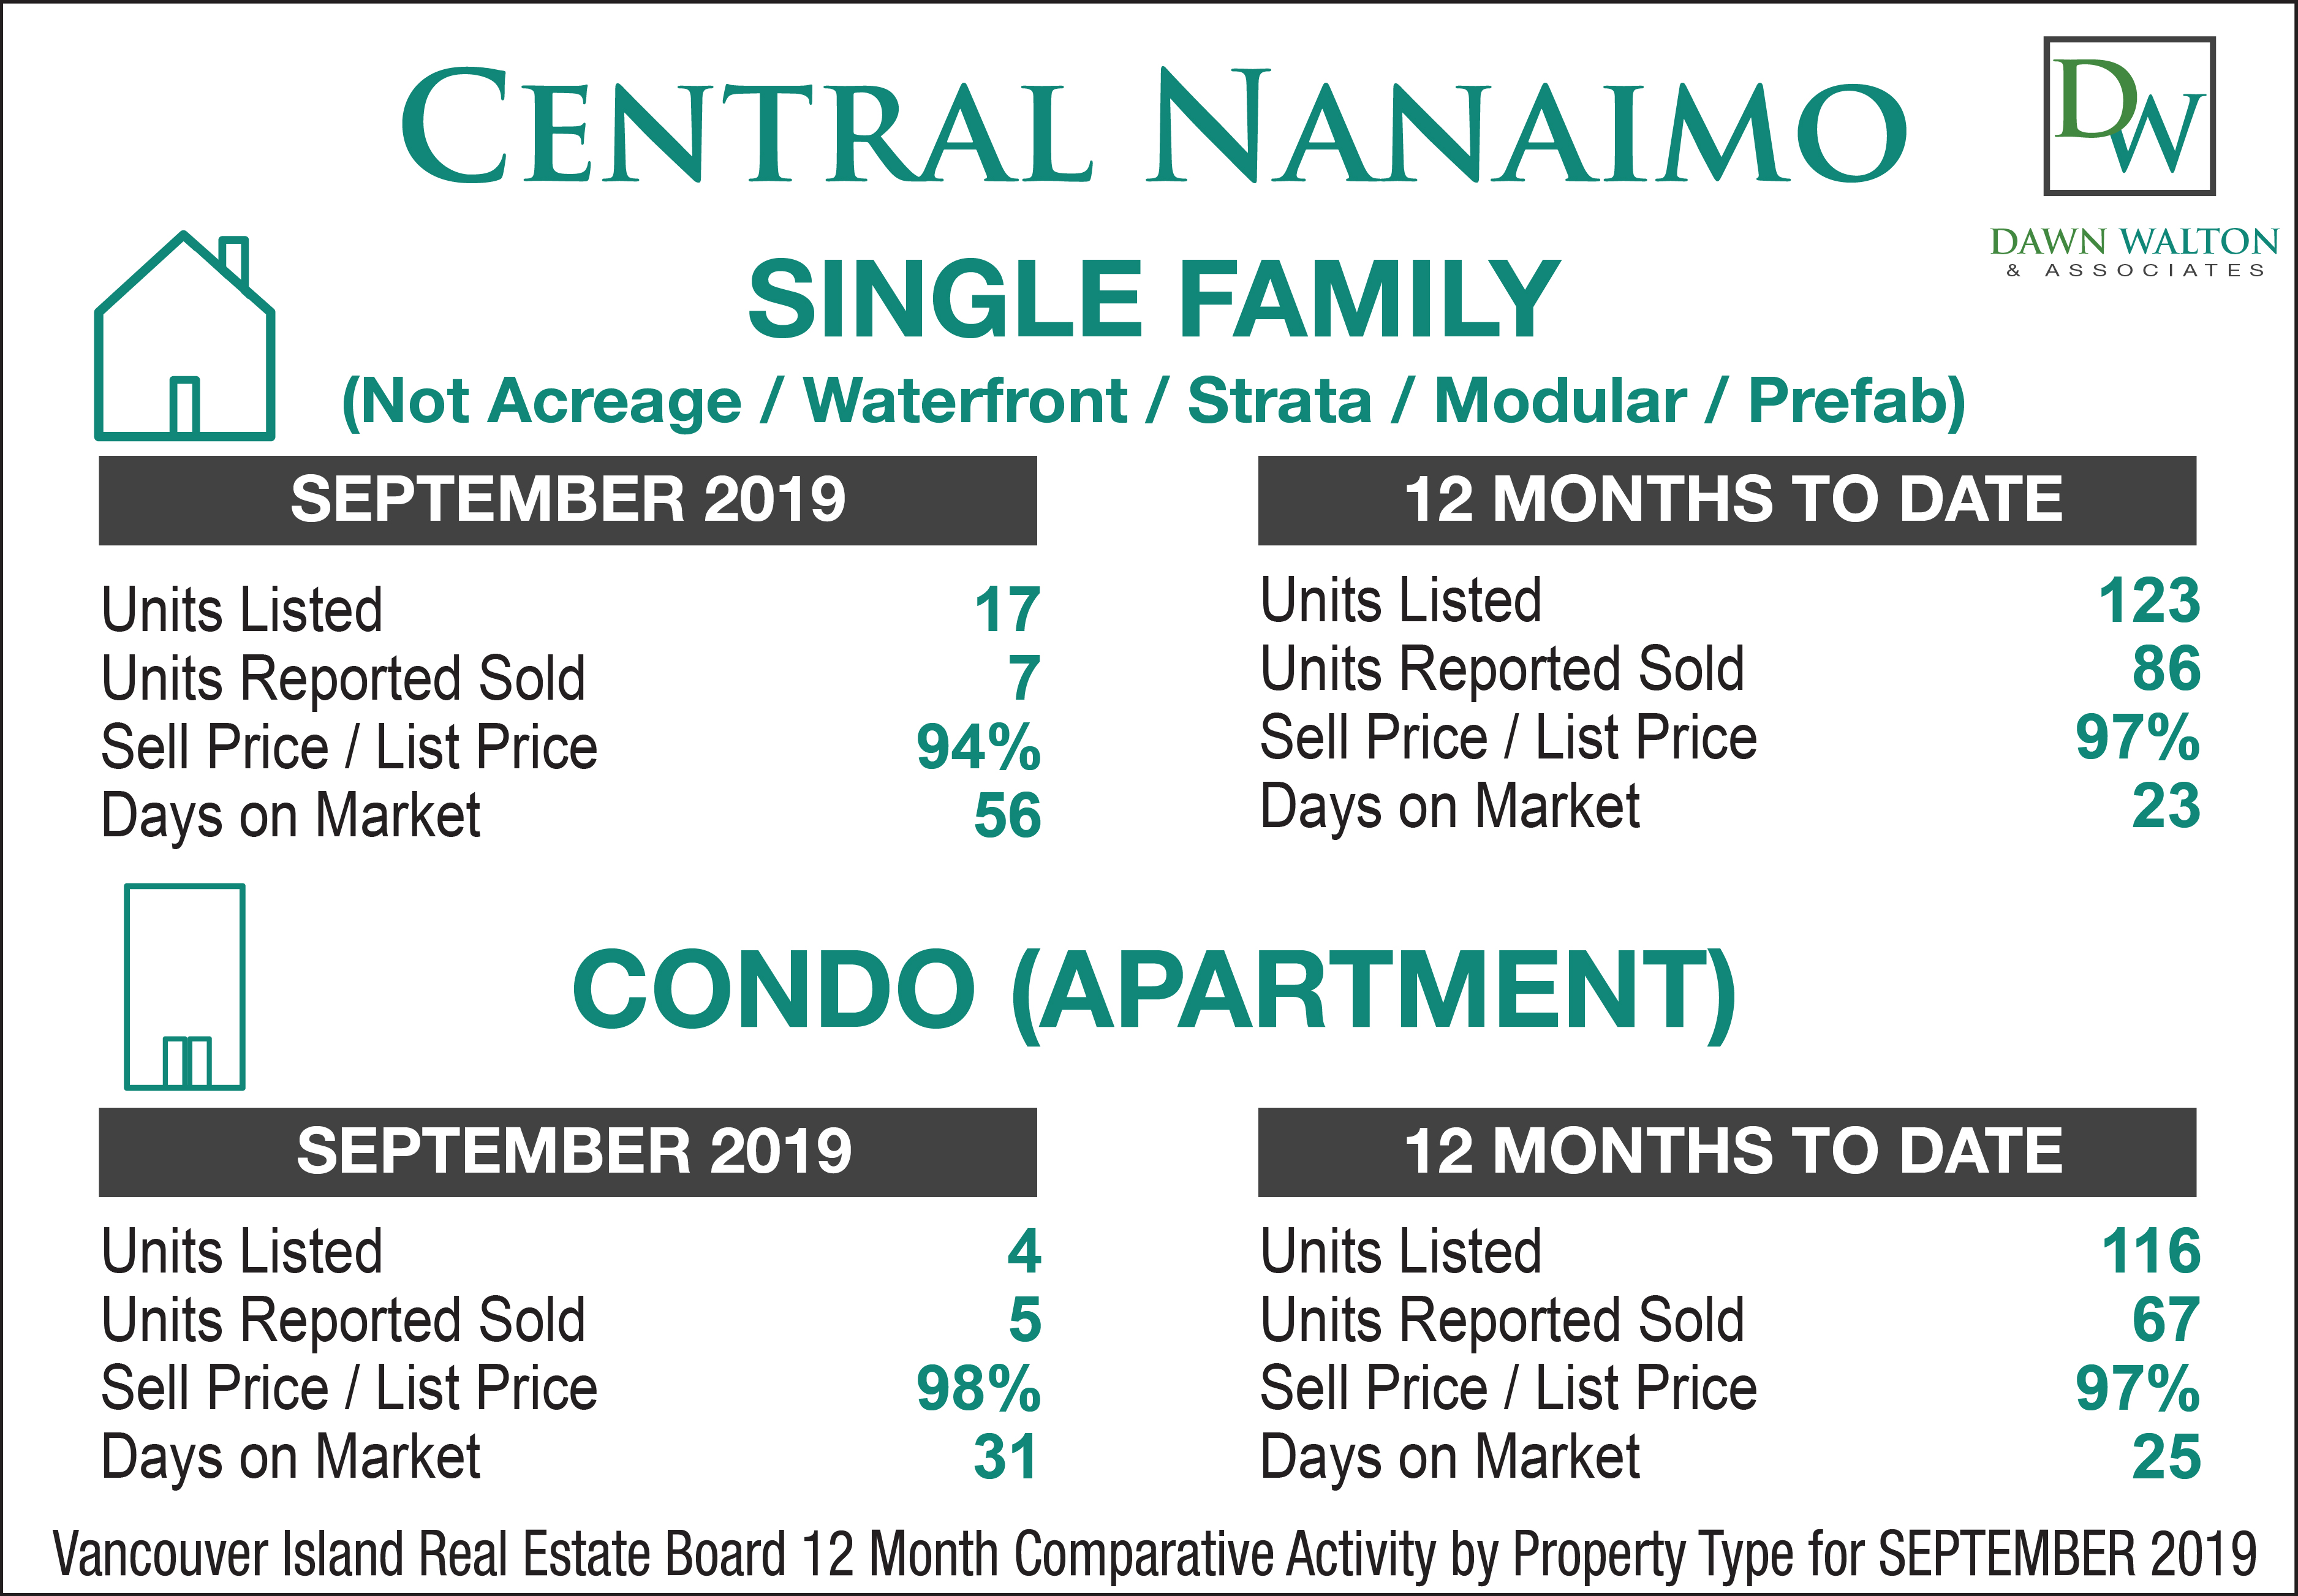 Central Nanaimo Real Estate Market Stats September 2019 - Nanaimo Realtor Dawn Walton